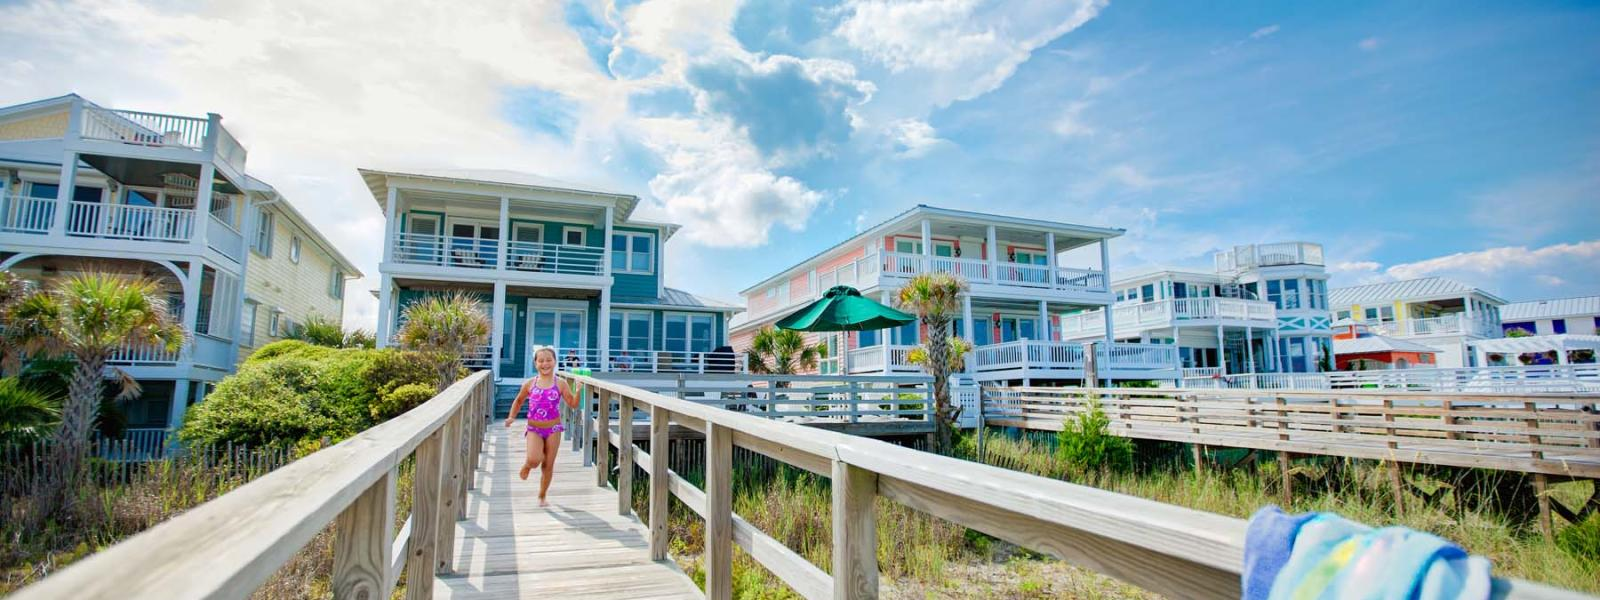 Hotels In Kure Beach Nc Motels Beachside Als